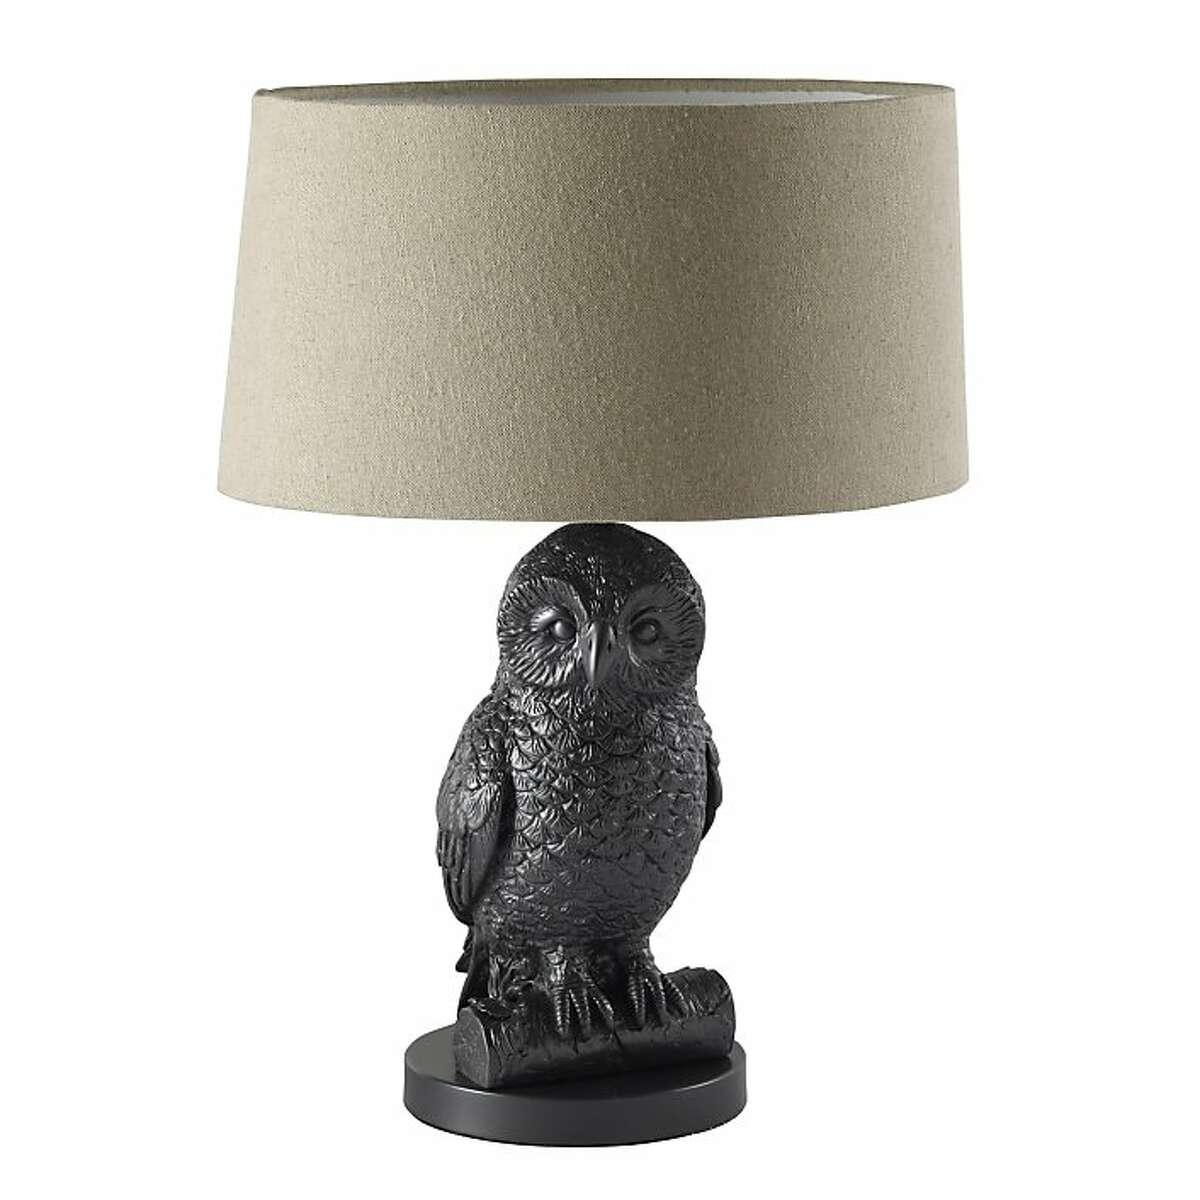 More: $99 Owl Table Light from West Elm (westelm.com)